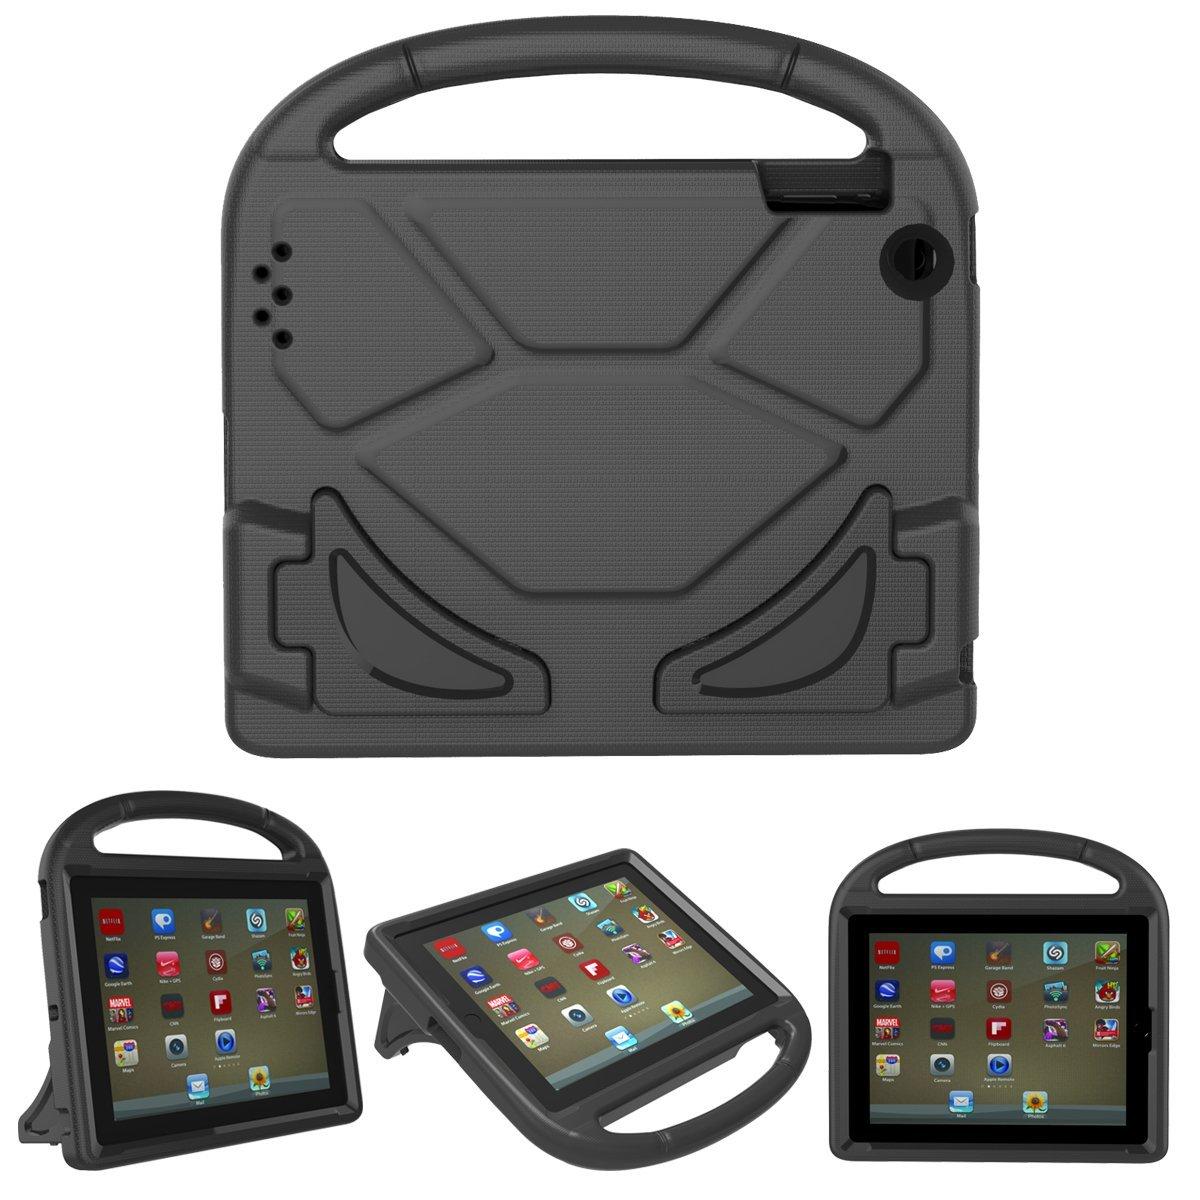 Kids Case for Apple iPad 2 3 4 Child Shockproof Proof Handle Stand Cover for iPad 2 iPad 3 iPad 4 Tablet Case Funda Capa